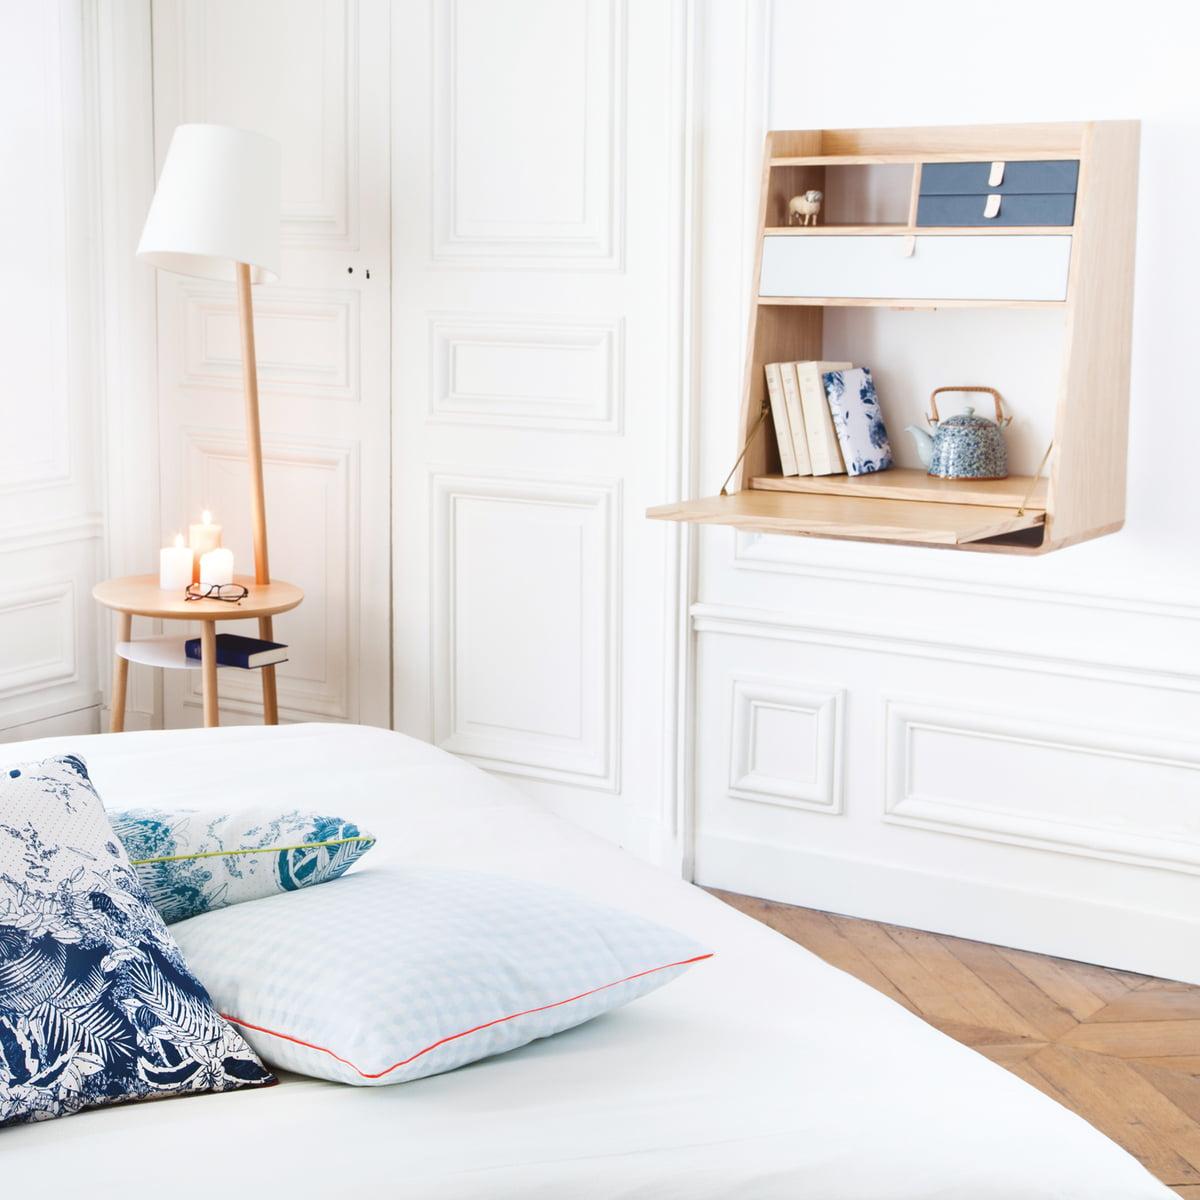 gaston wandsekret r von hart connox shop. Black Bedroom Furniture Sets. Home Design Ideas